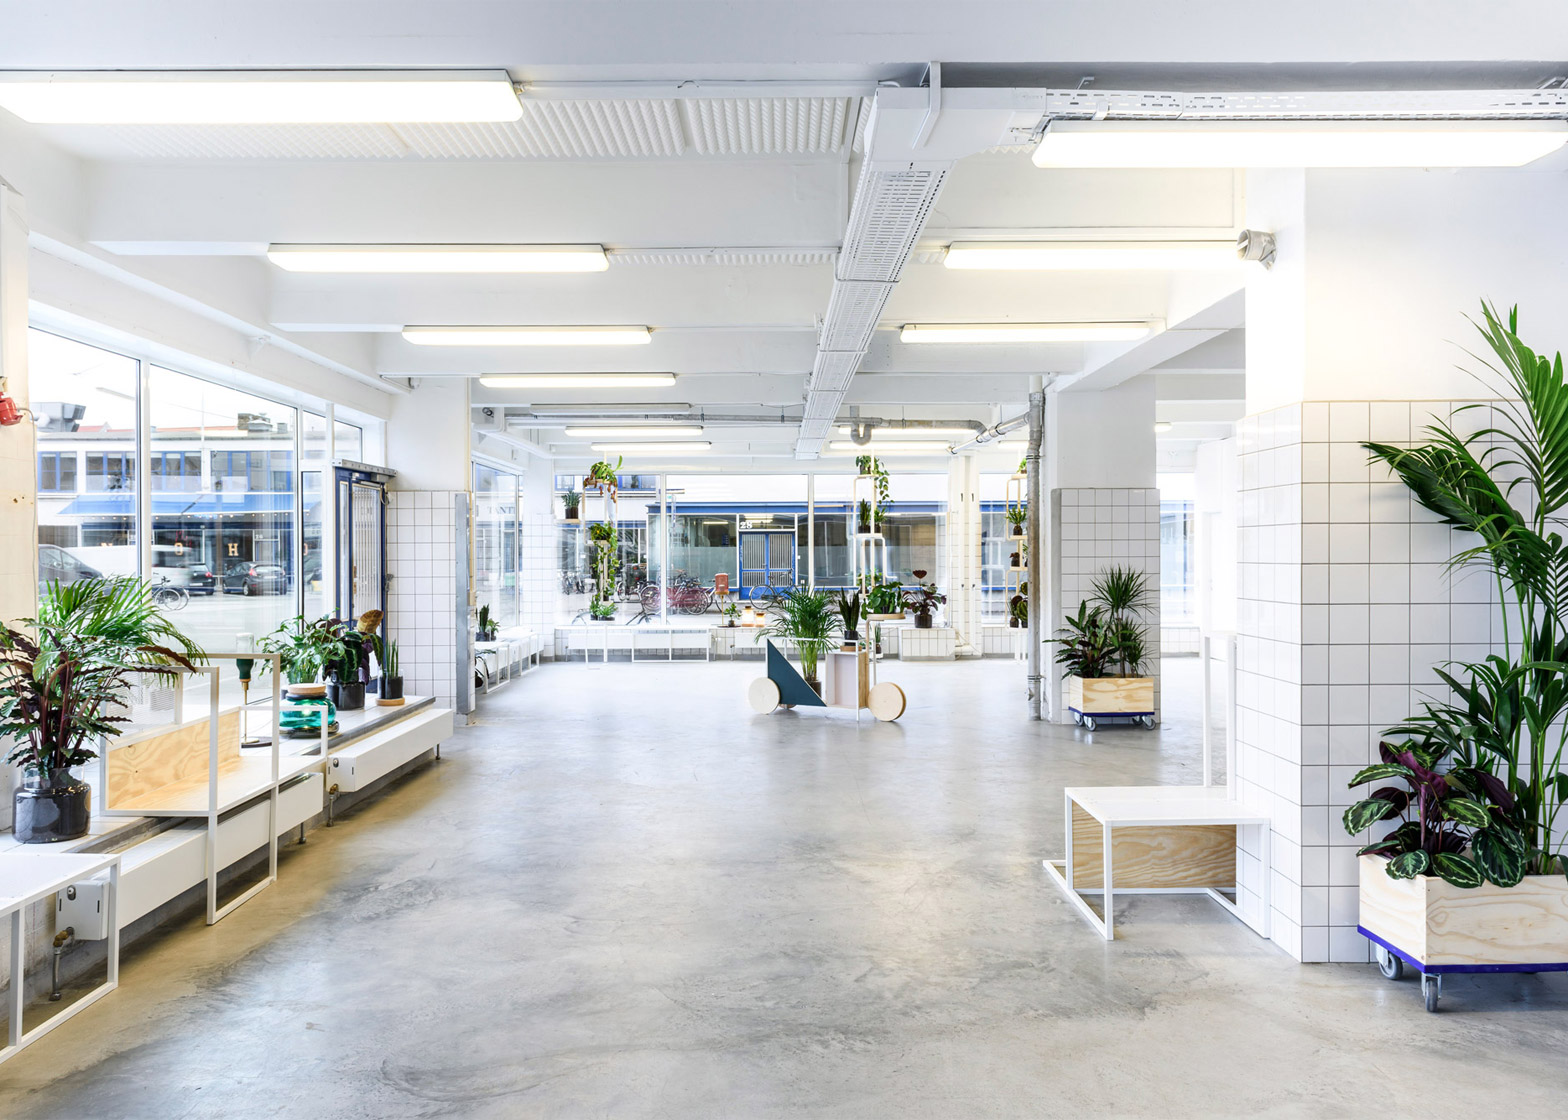 Ikea-Space-10-Innovation-Lab_Alastair-Philip-Wiper_dezeen_1568_15